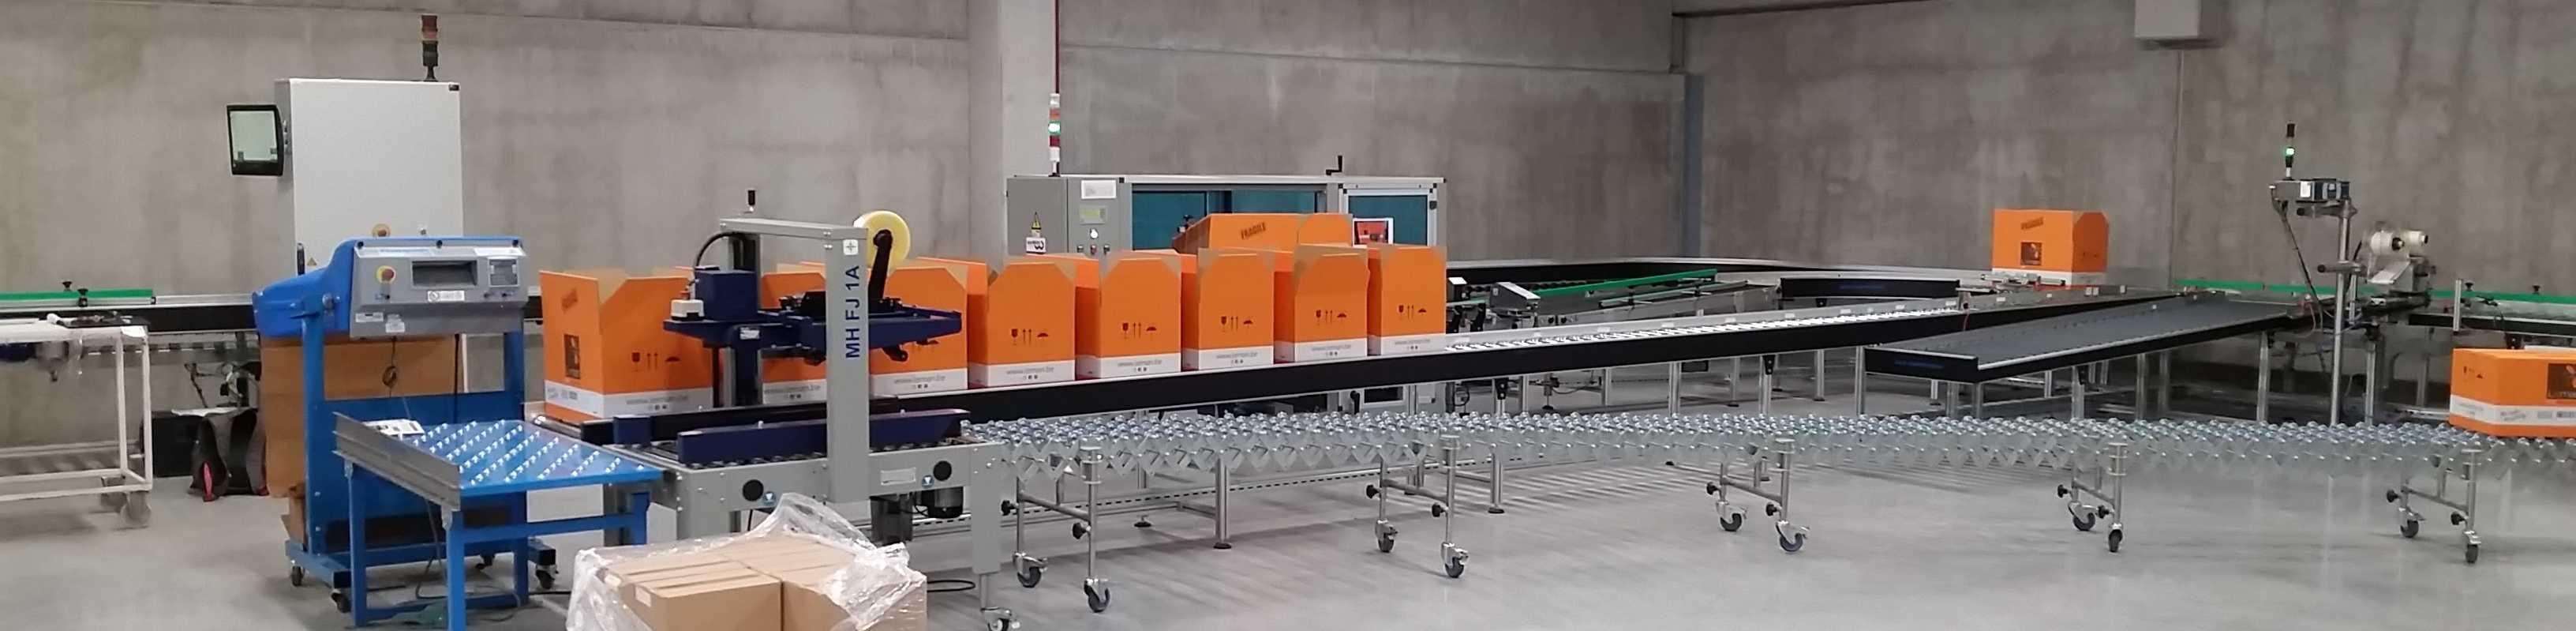 IA Slider industriele automatisering LS Logistiek transport systeem rollenbanen banner